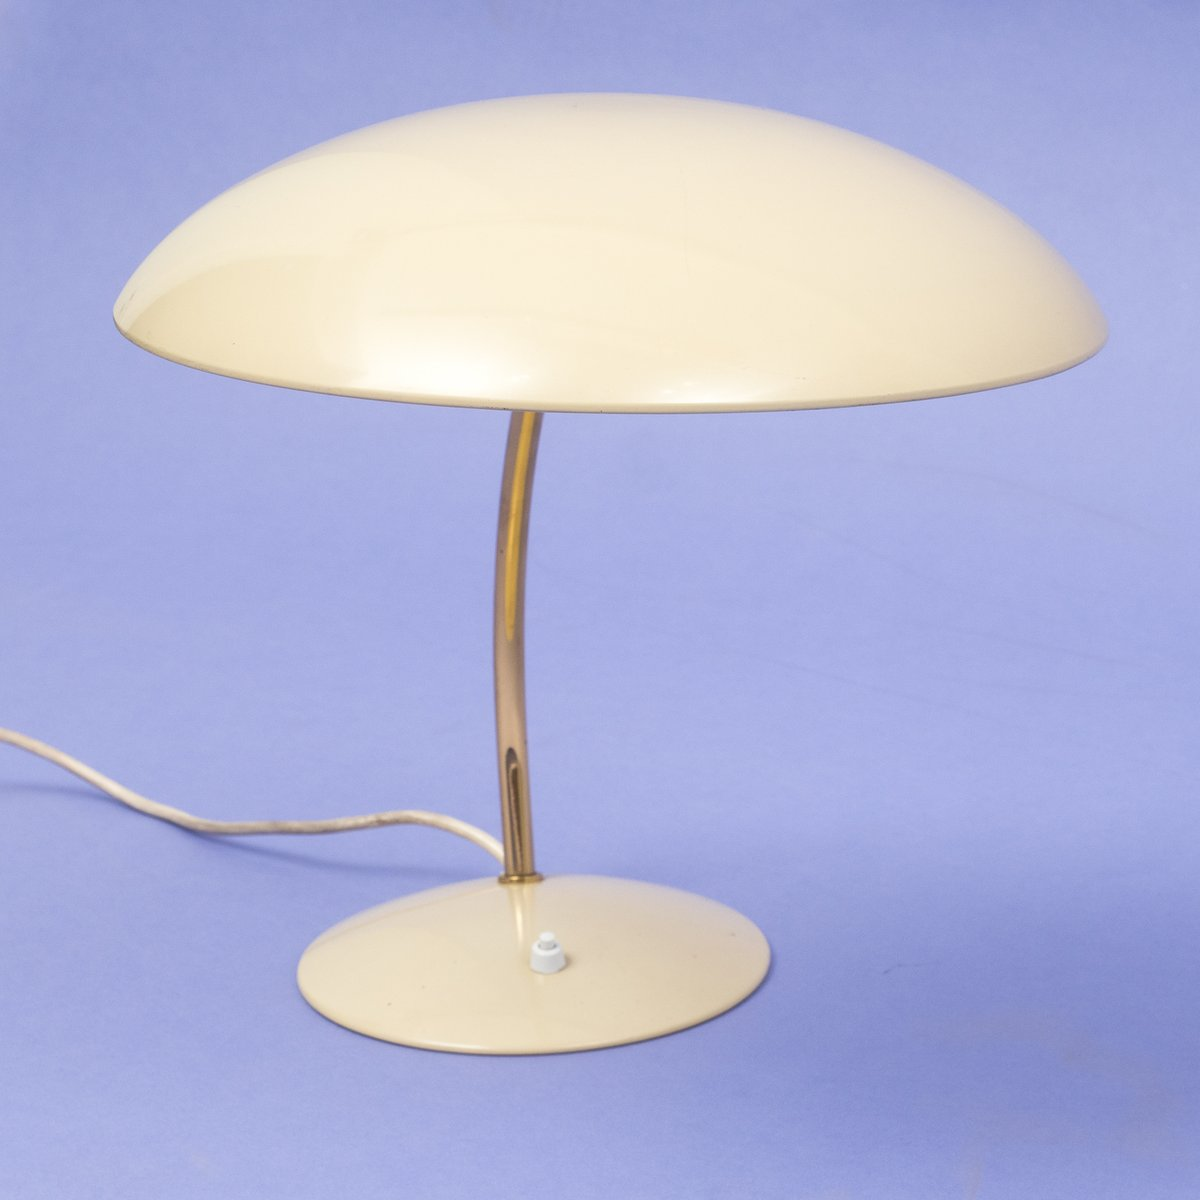 Vintage Model 6782 Table Lamp By Christian Dell For Kaiser